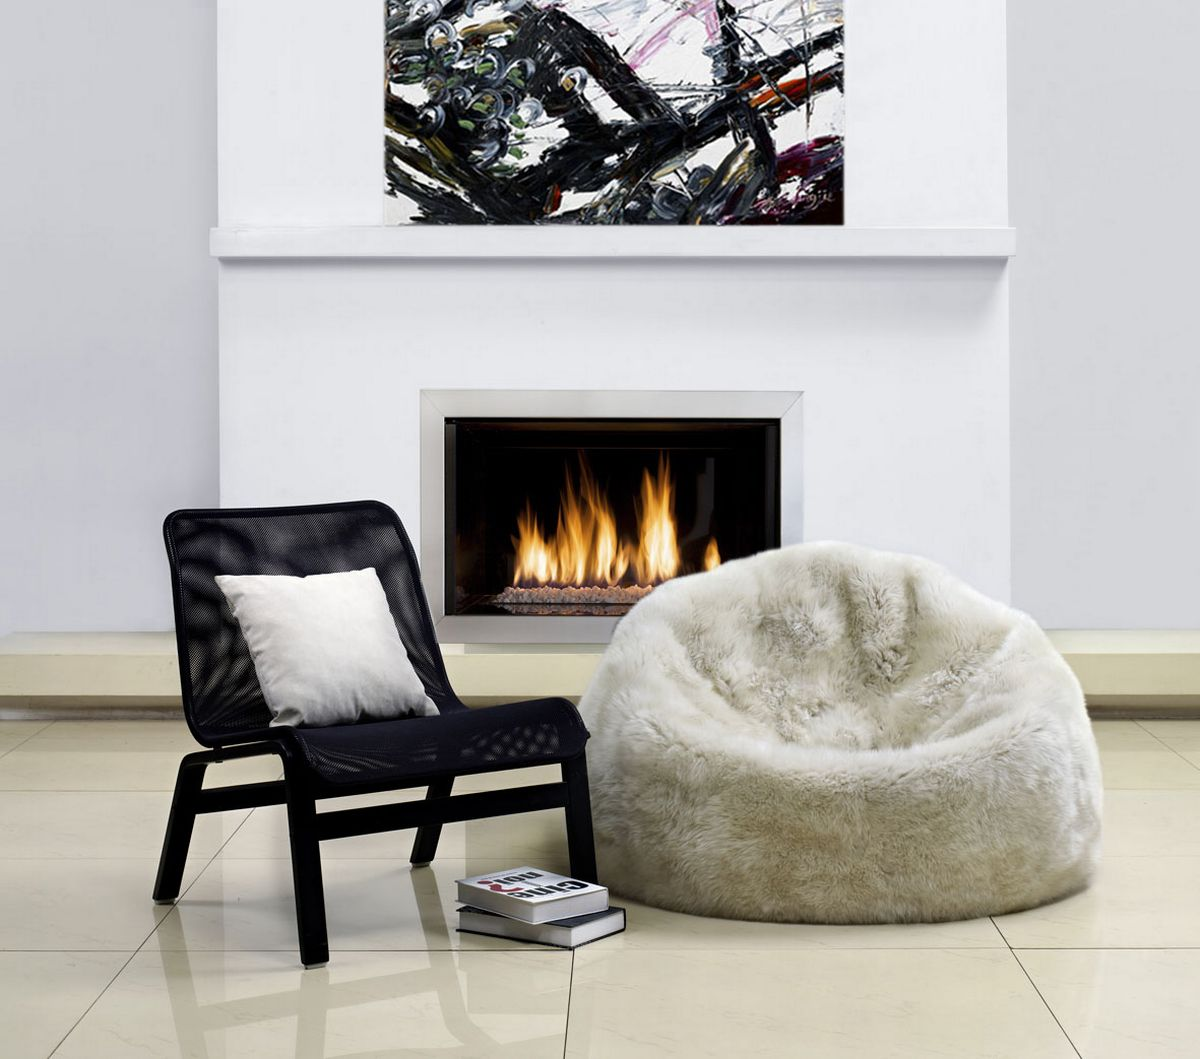 Fibre by Auskin Beanbag - Natures Fleece Ultimate Seating